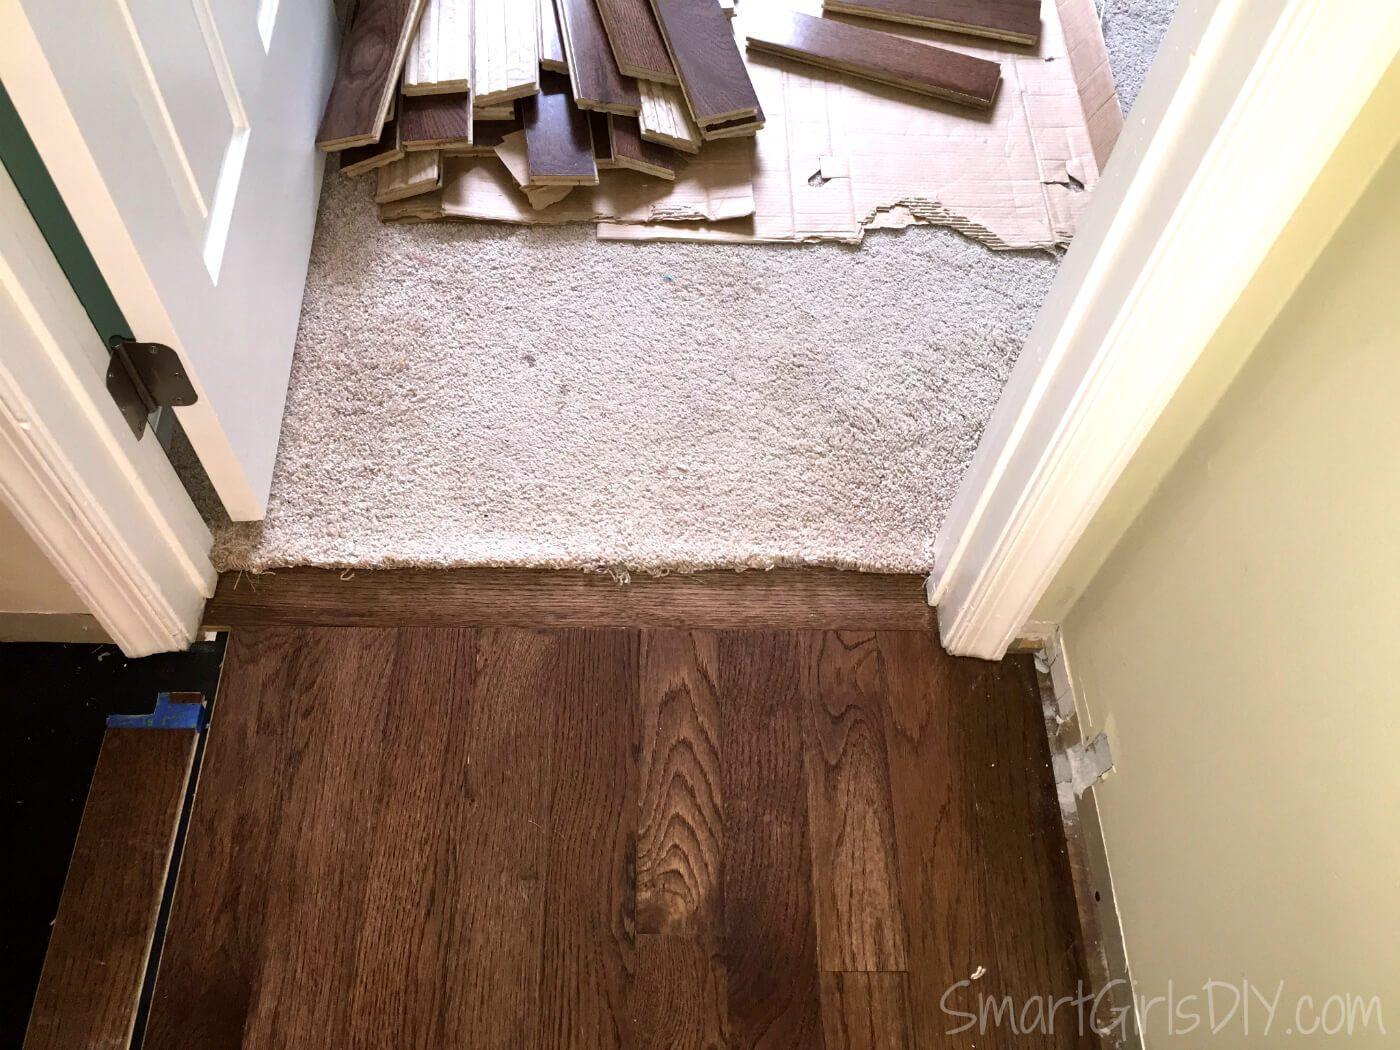 home depot hardwood floor nailer rental of upstairs hallway 1 installing hardwood floors with regard to transition between carpet and hardwood floor